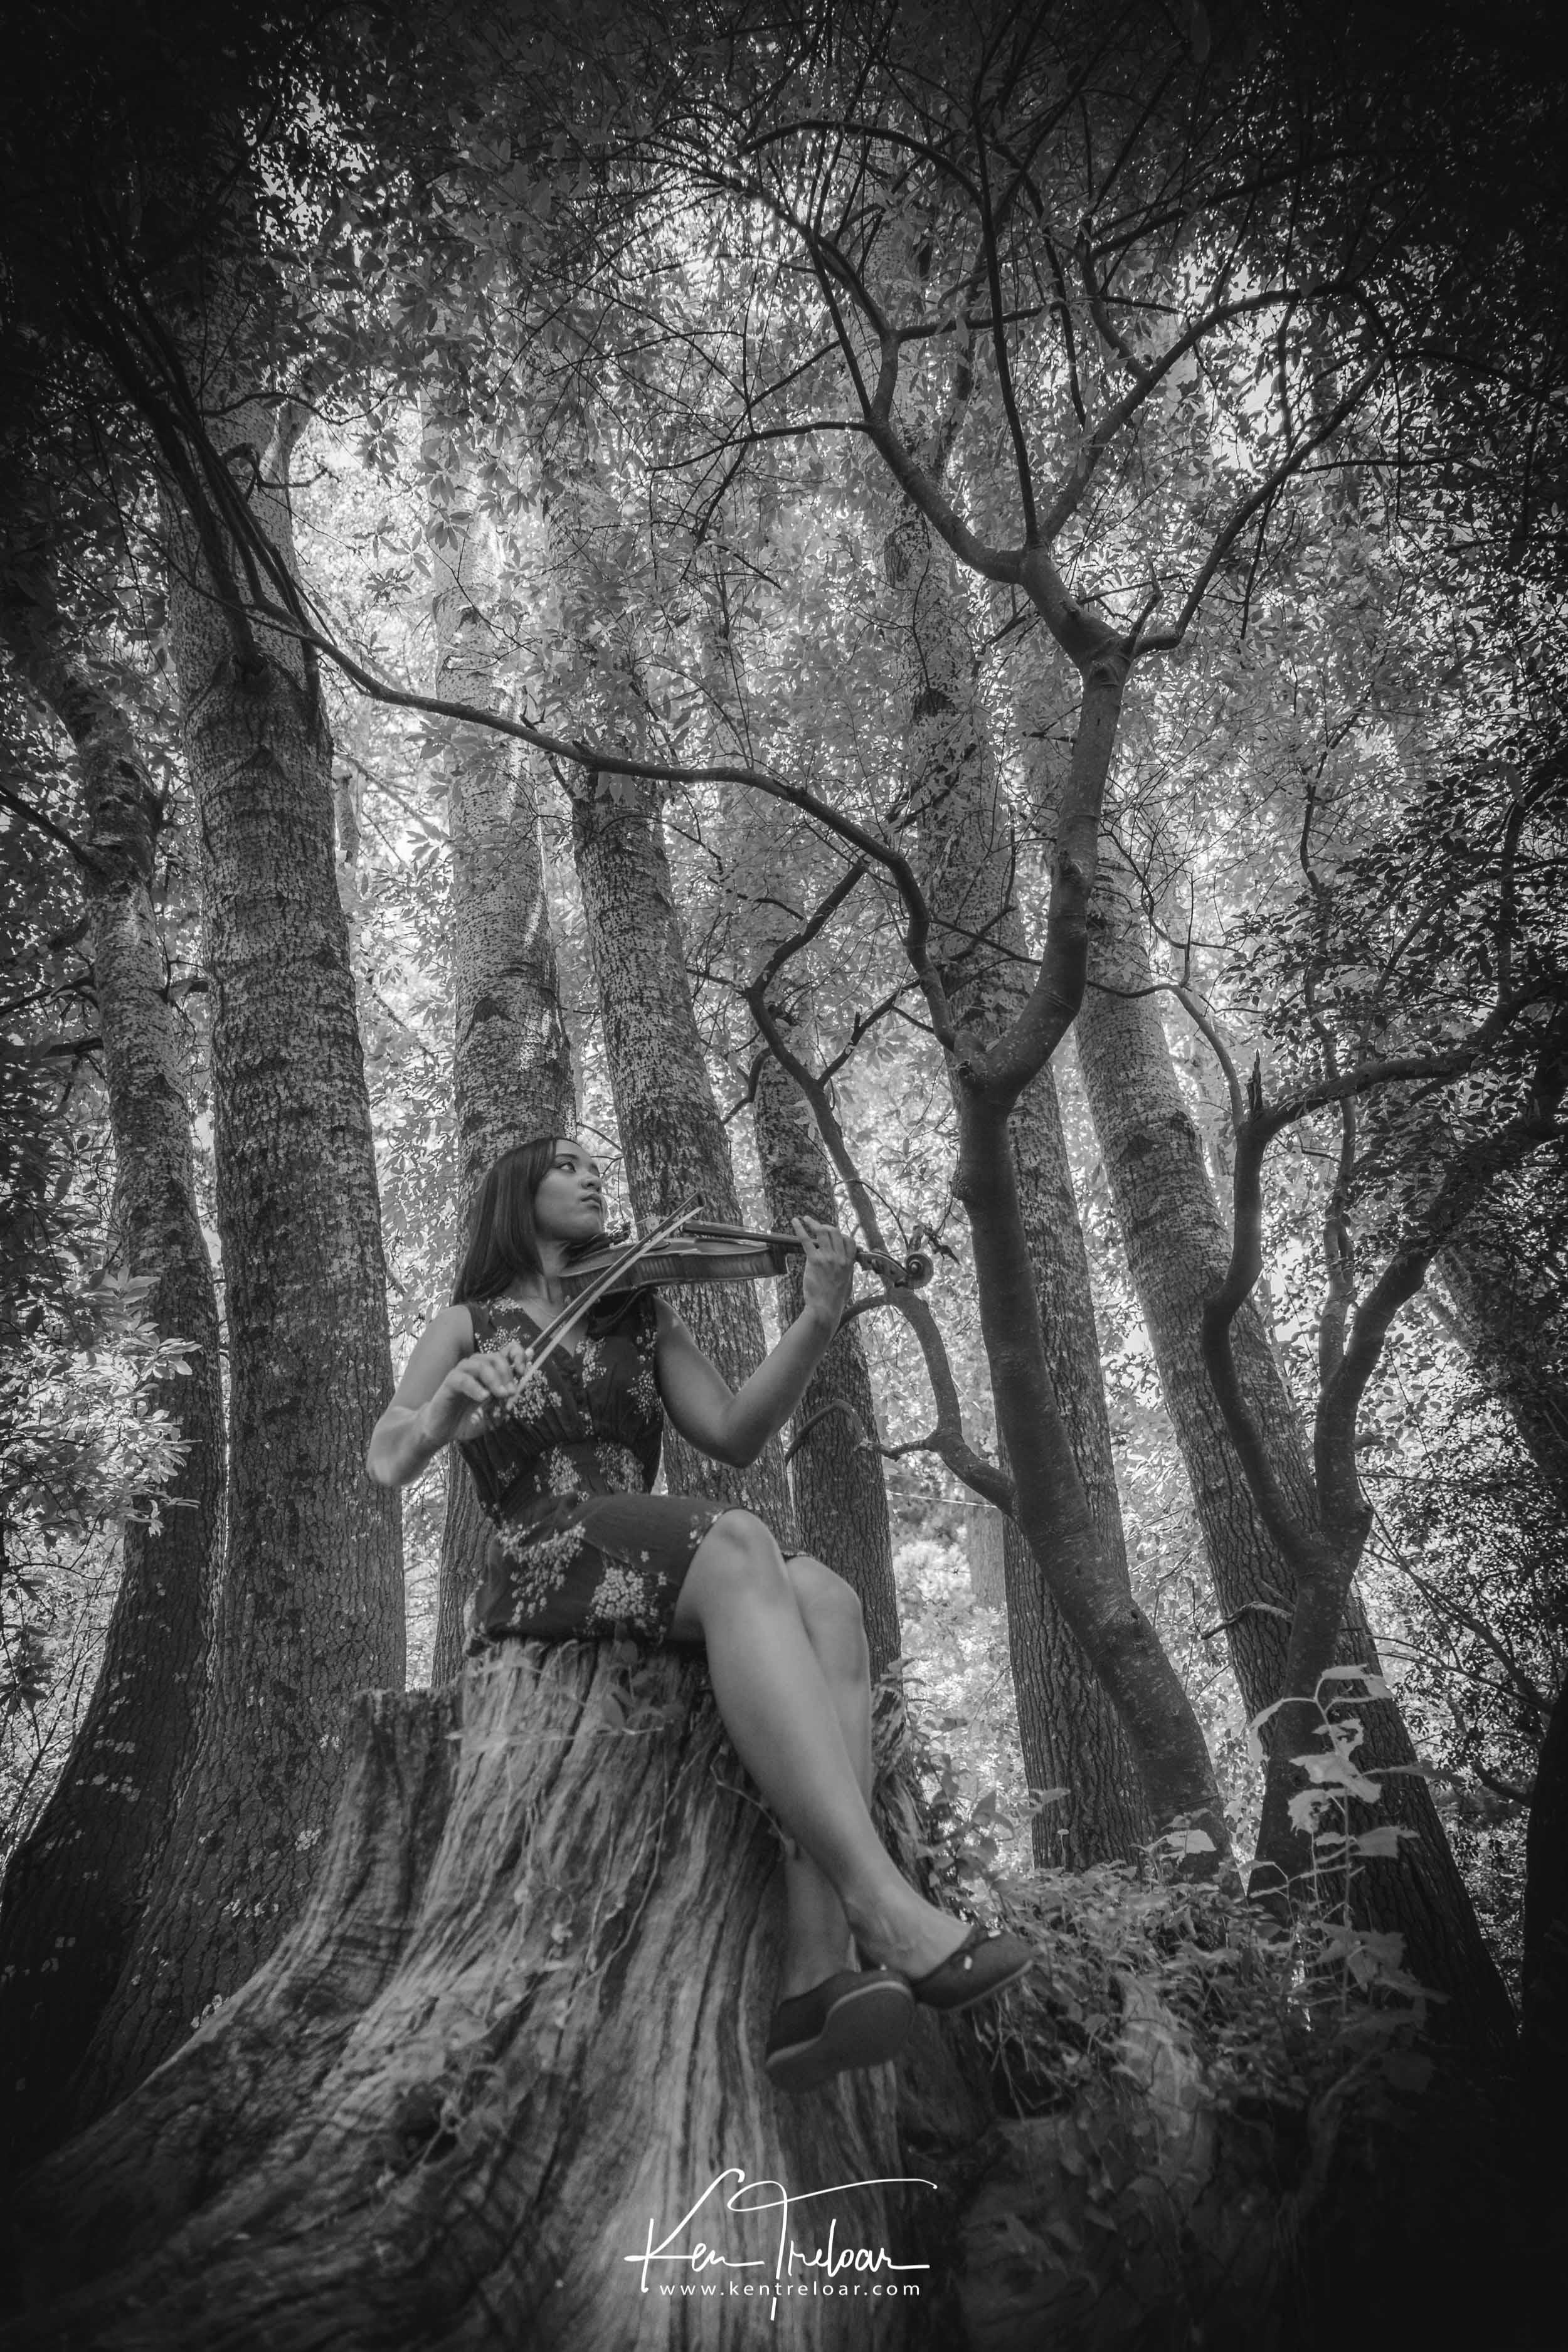 Ken Treloar Photography - Dec 2018 - Violin Woodland Forest Natural Light Portrait Photography - Cape Town-2.jpg